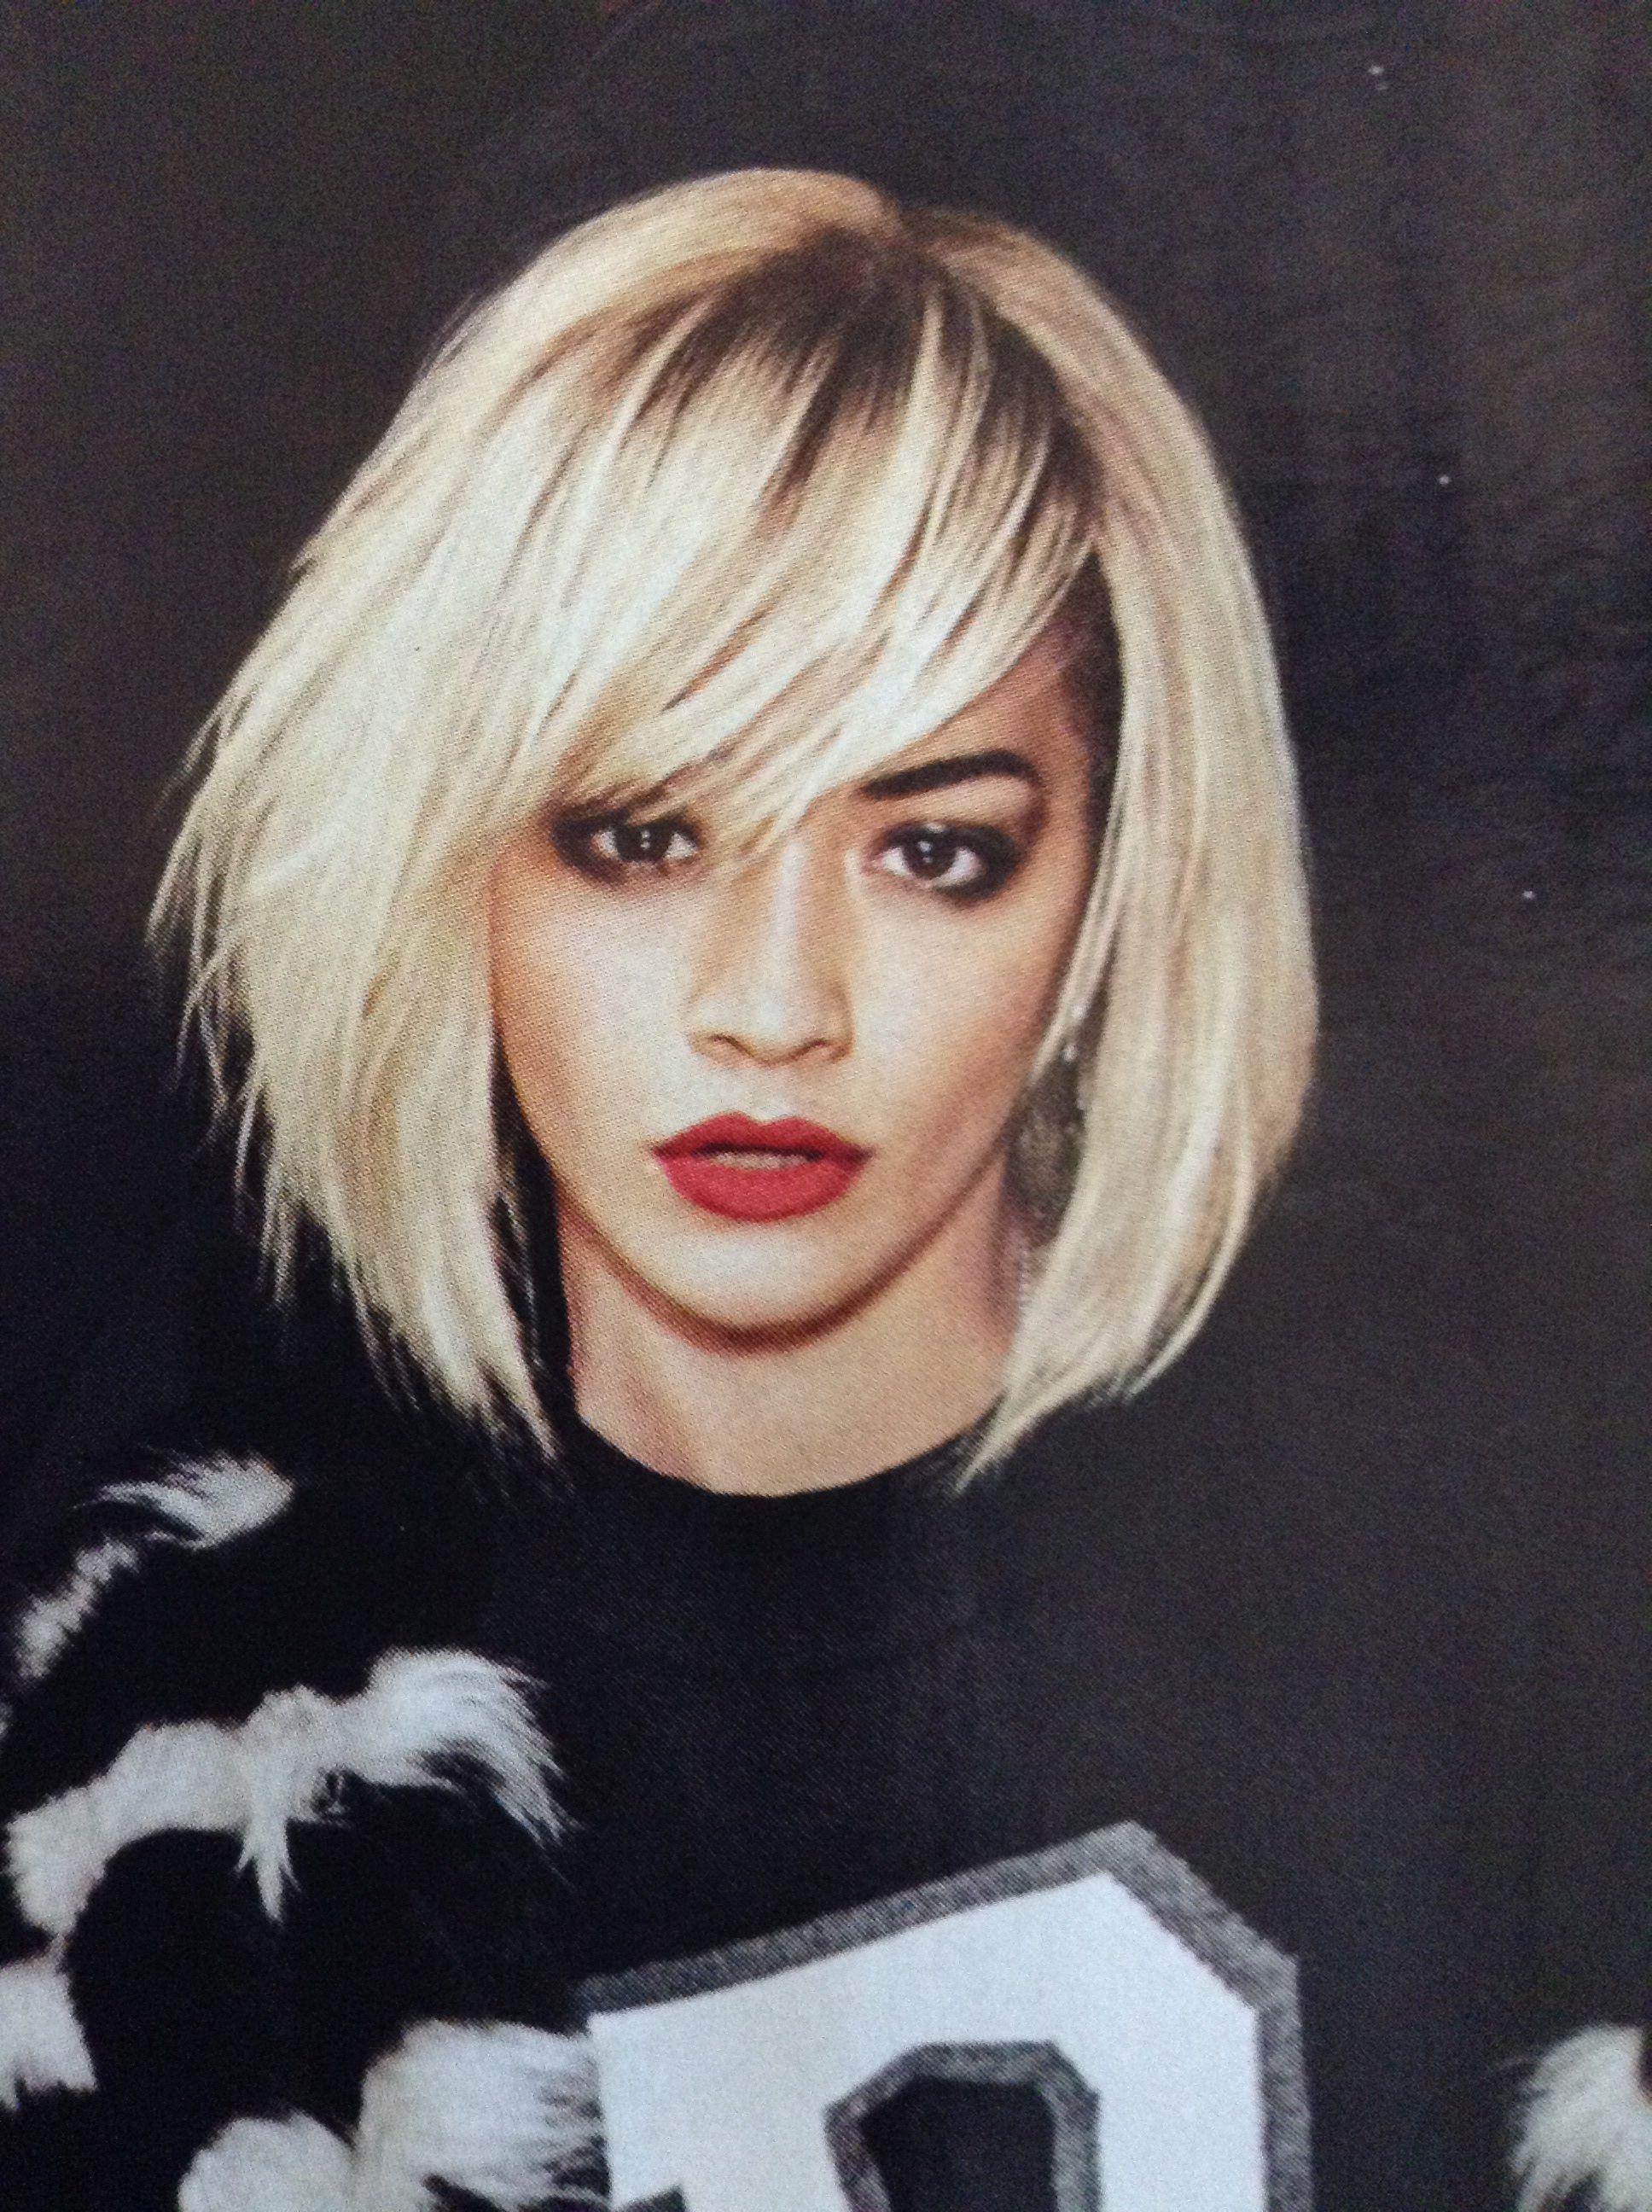 Rita Ora Hair And Makeup Perfection Dark Roots Blonde Hair Hair Styles Short Hair Styles